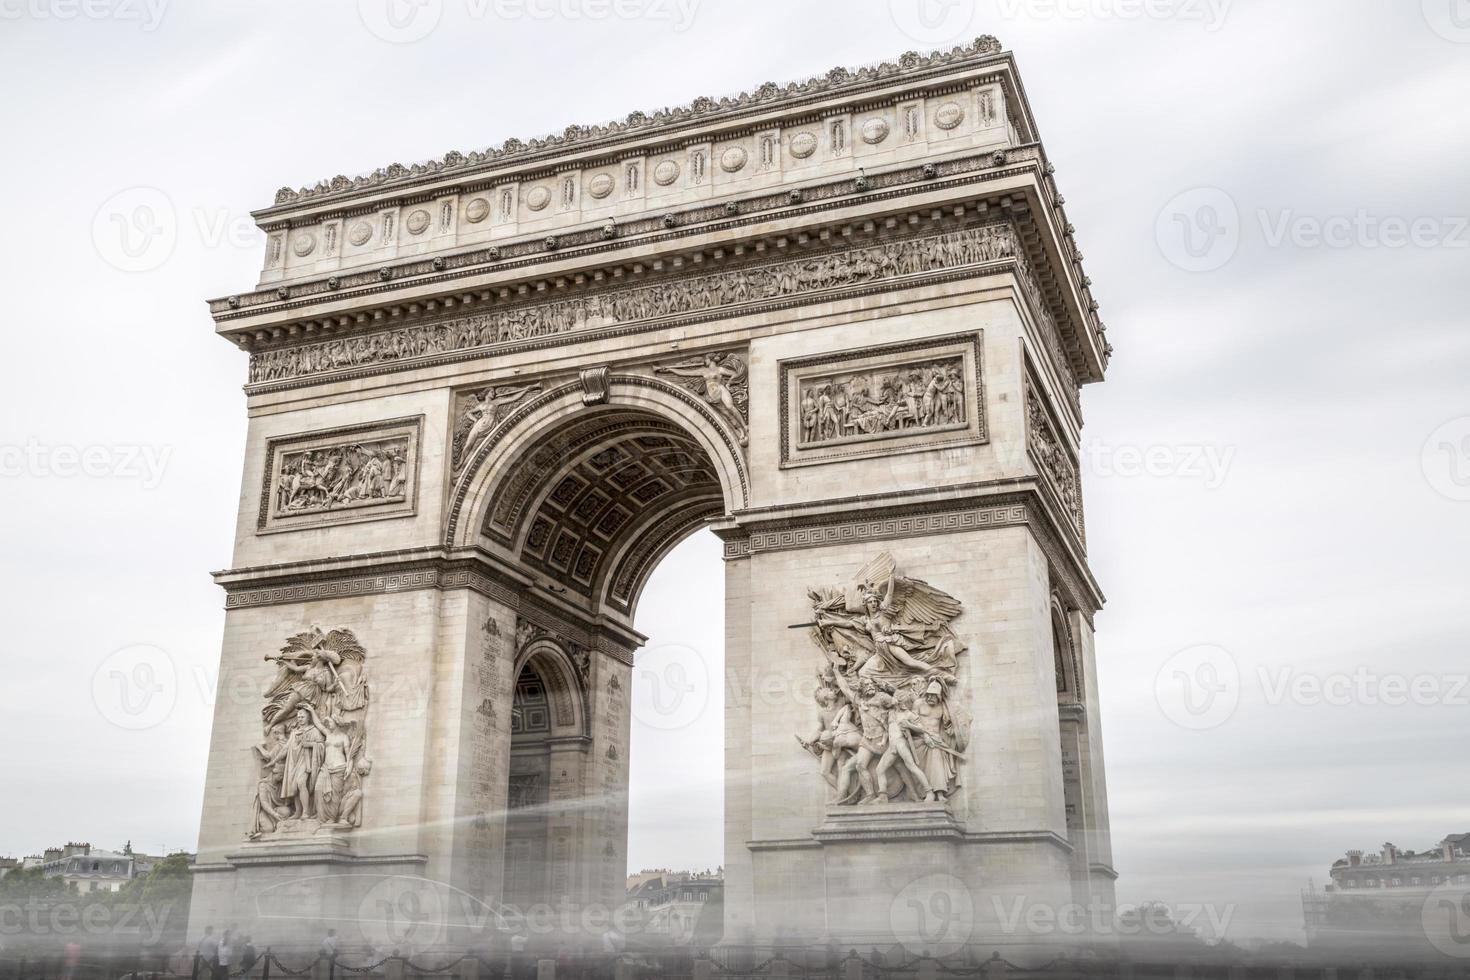 arco di trionfo a Parigi, Francia foto